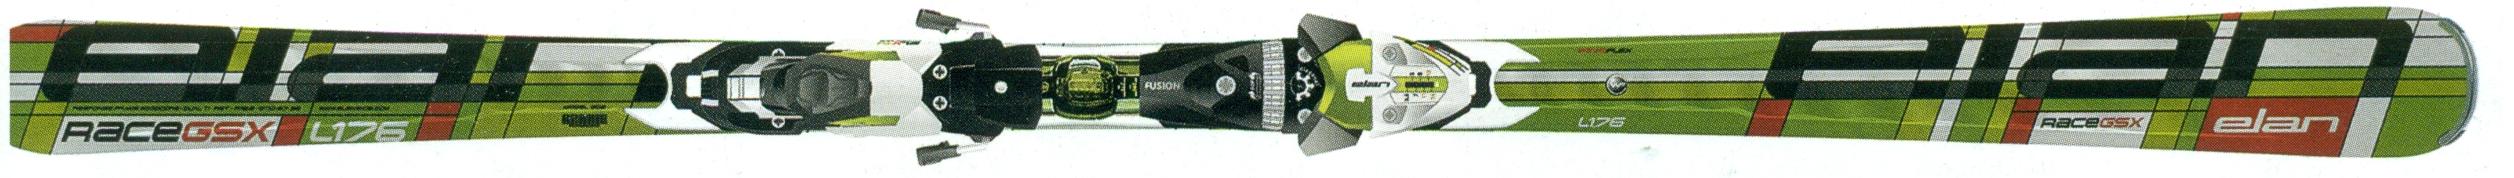 GSX FIS Waveflex Plate